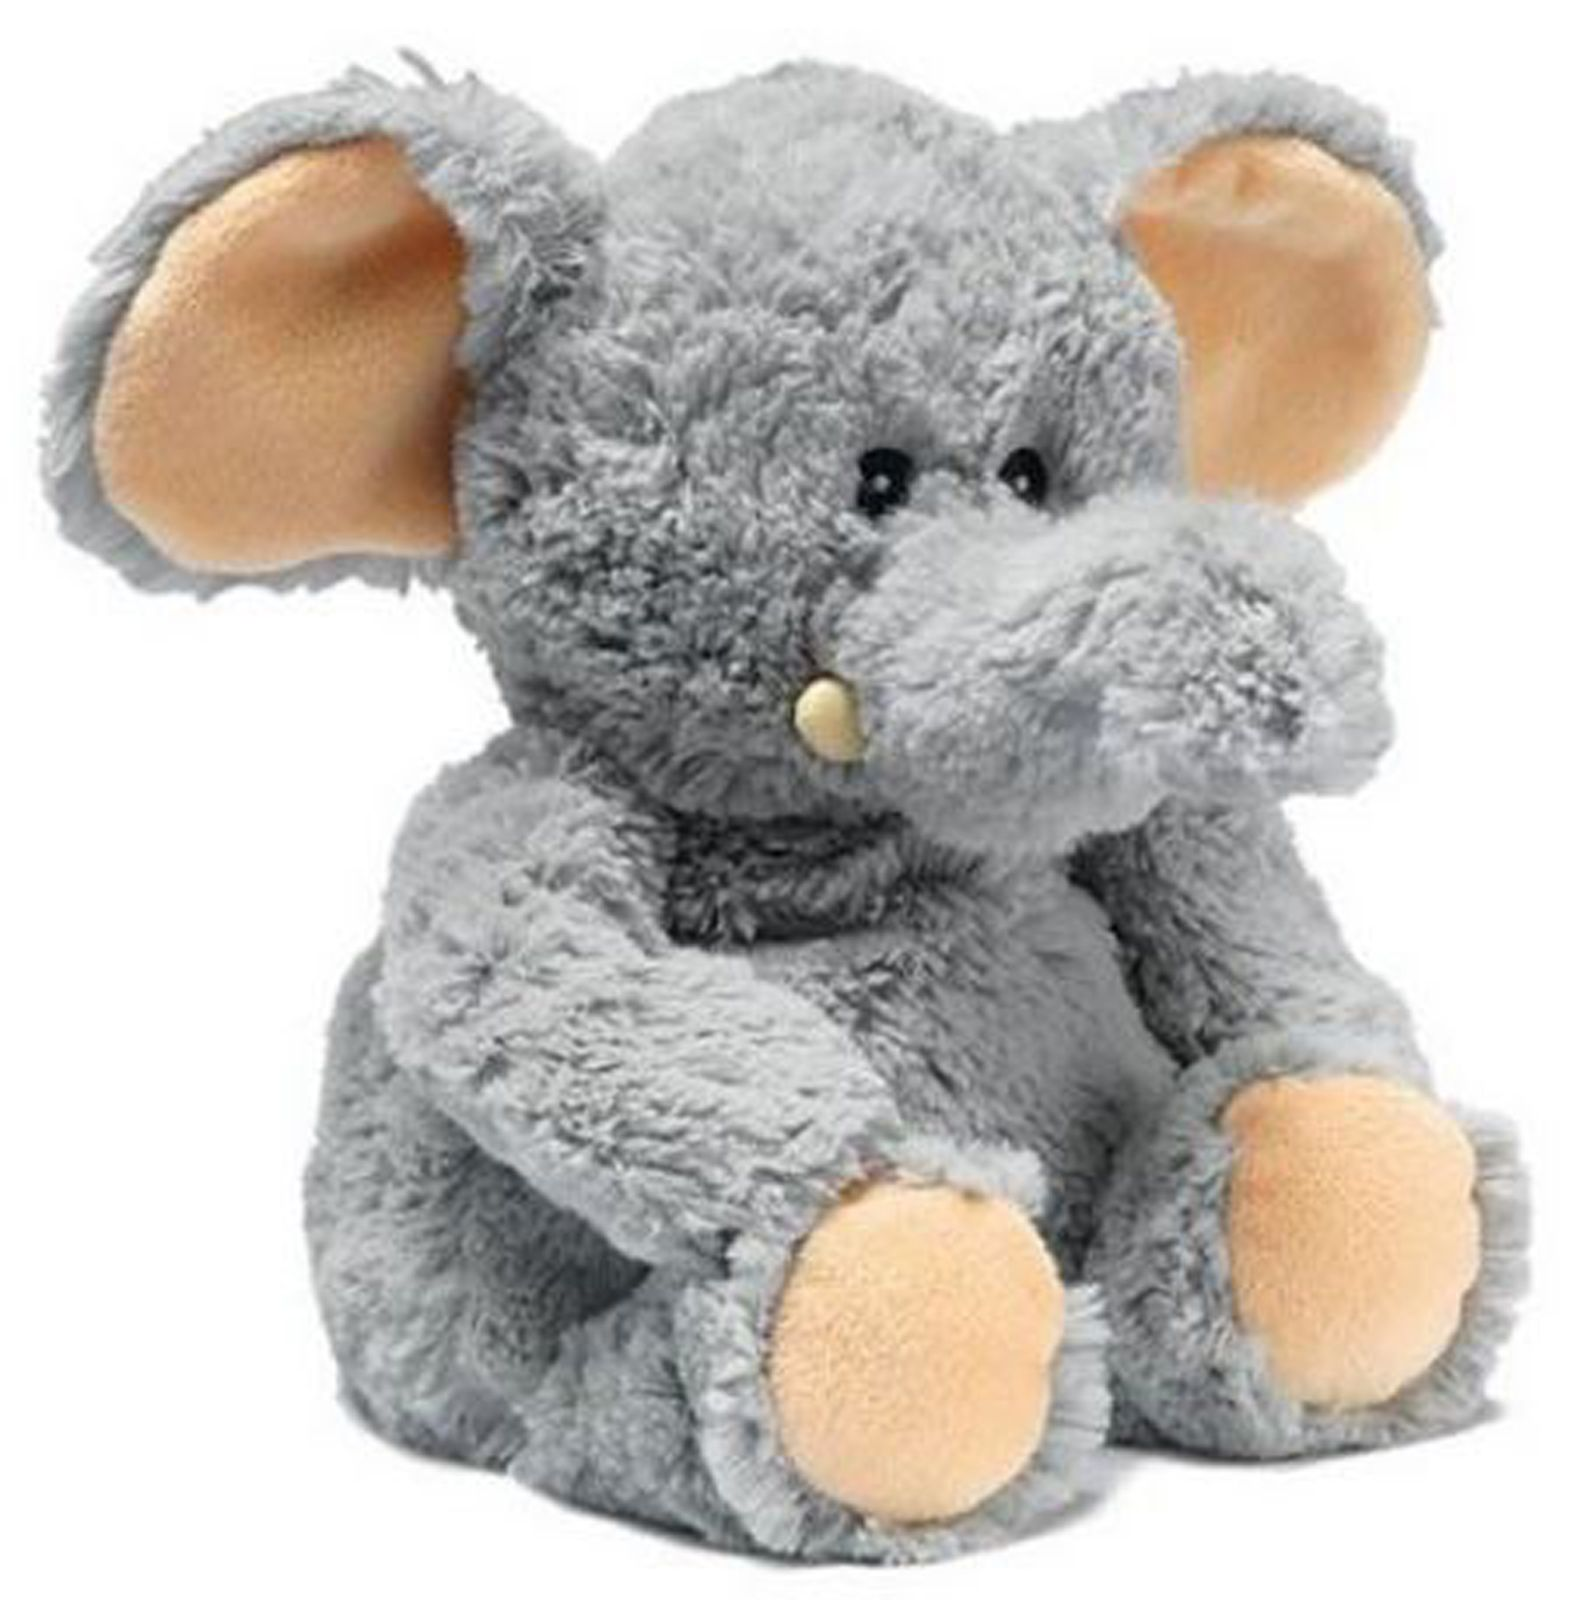 Cute Elephant Stuffed Animal Intelex Grey Elephant